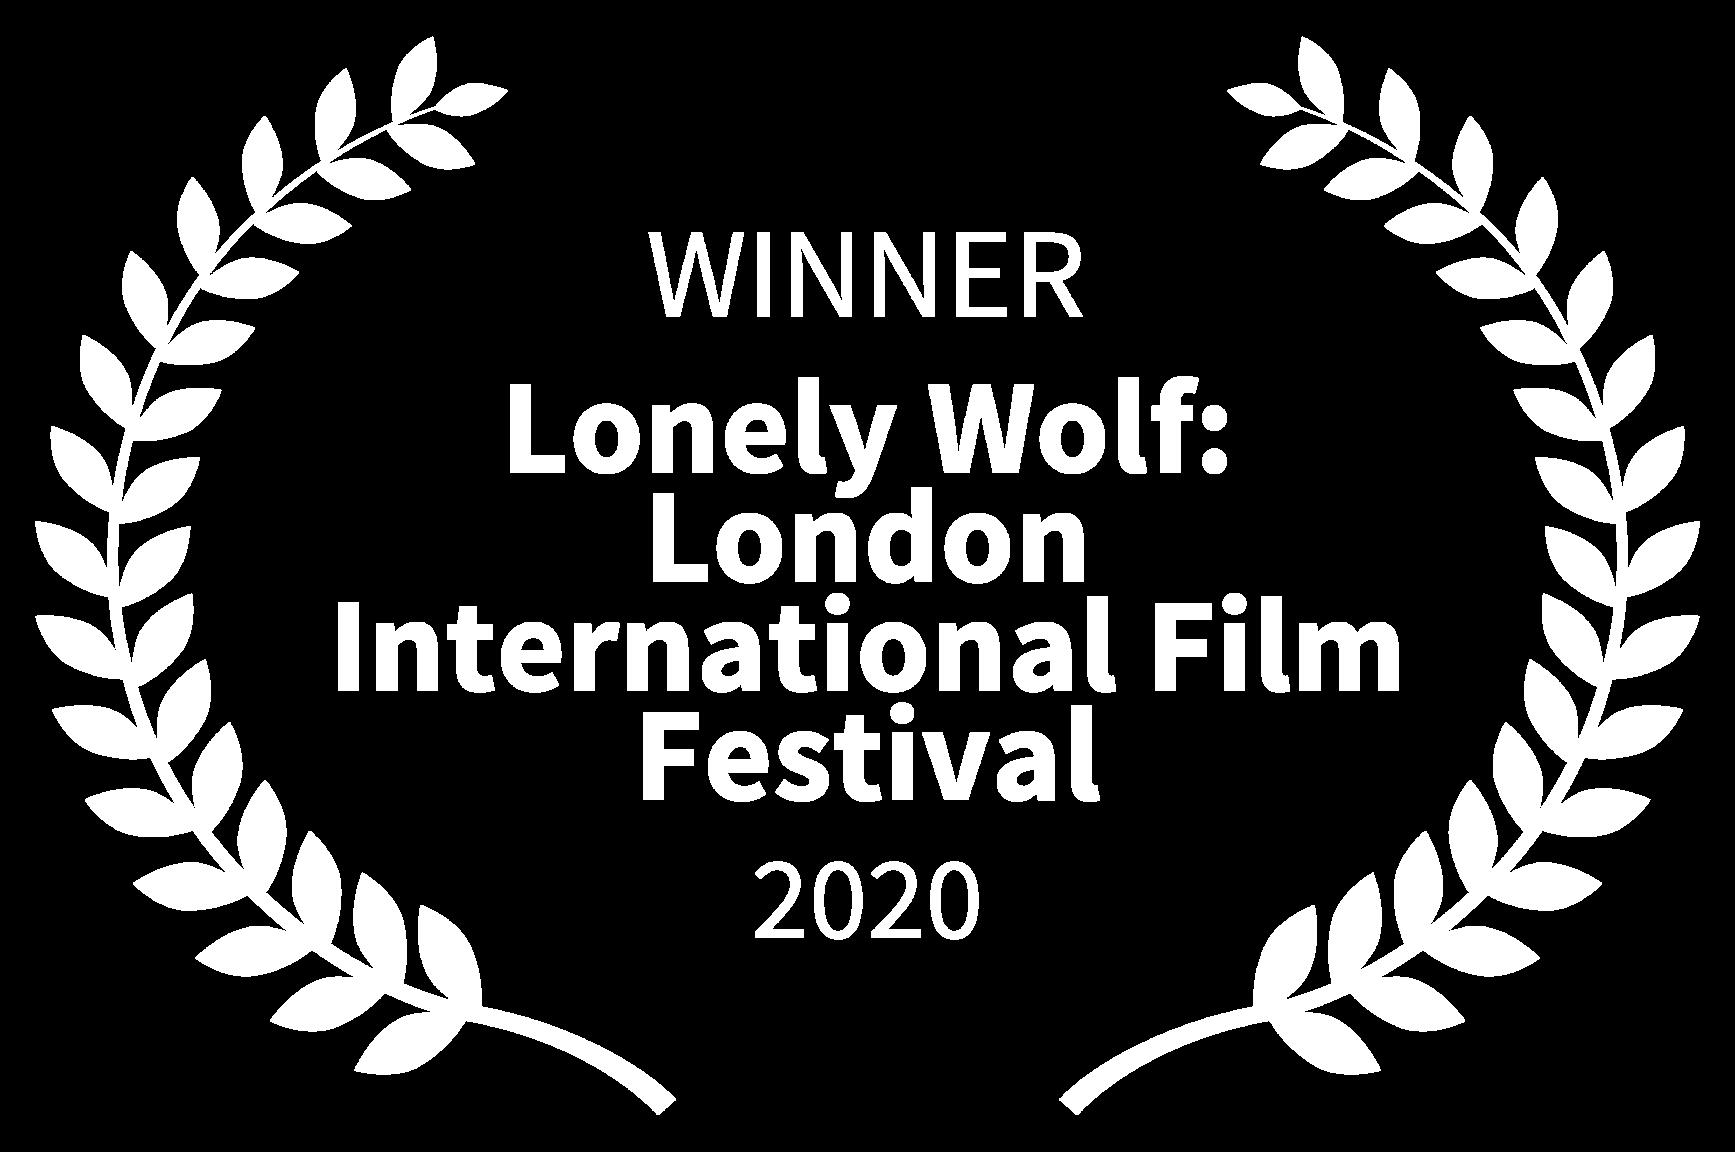 WINNER - Lonely Wolf London International Film Festival - 2020